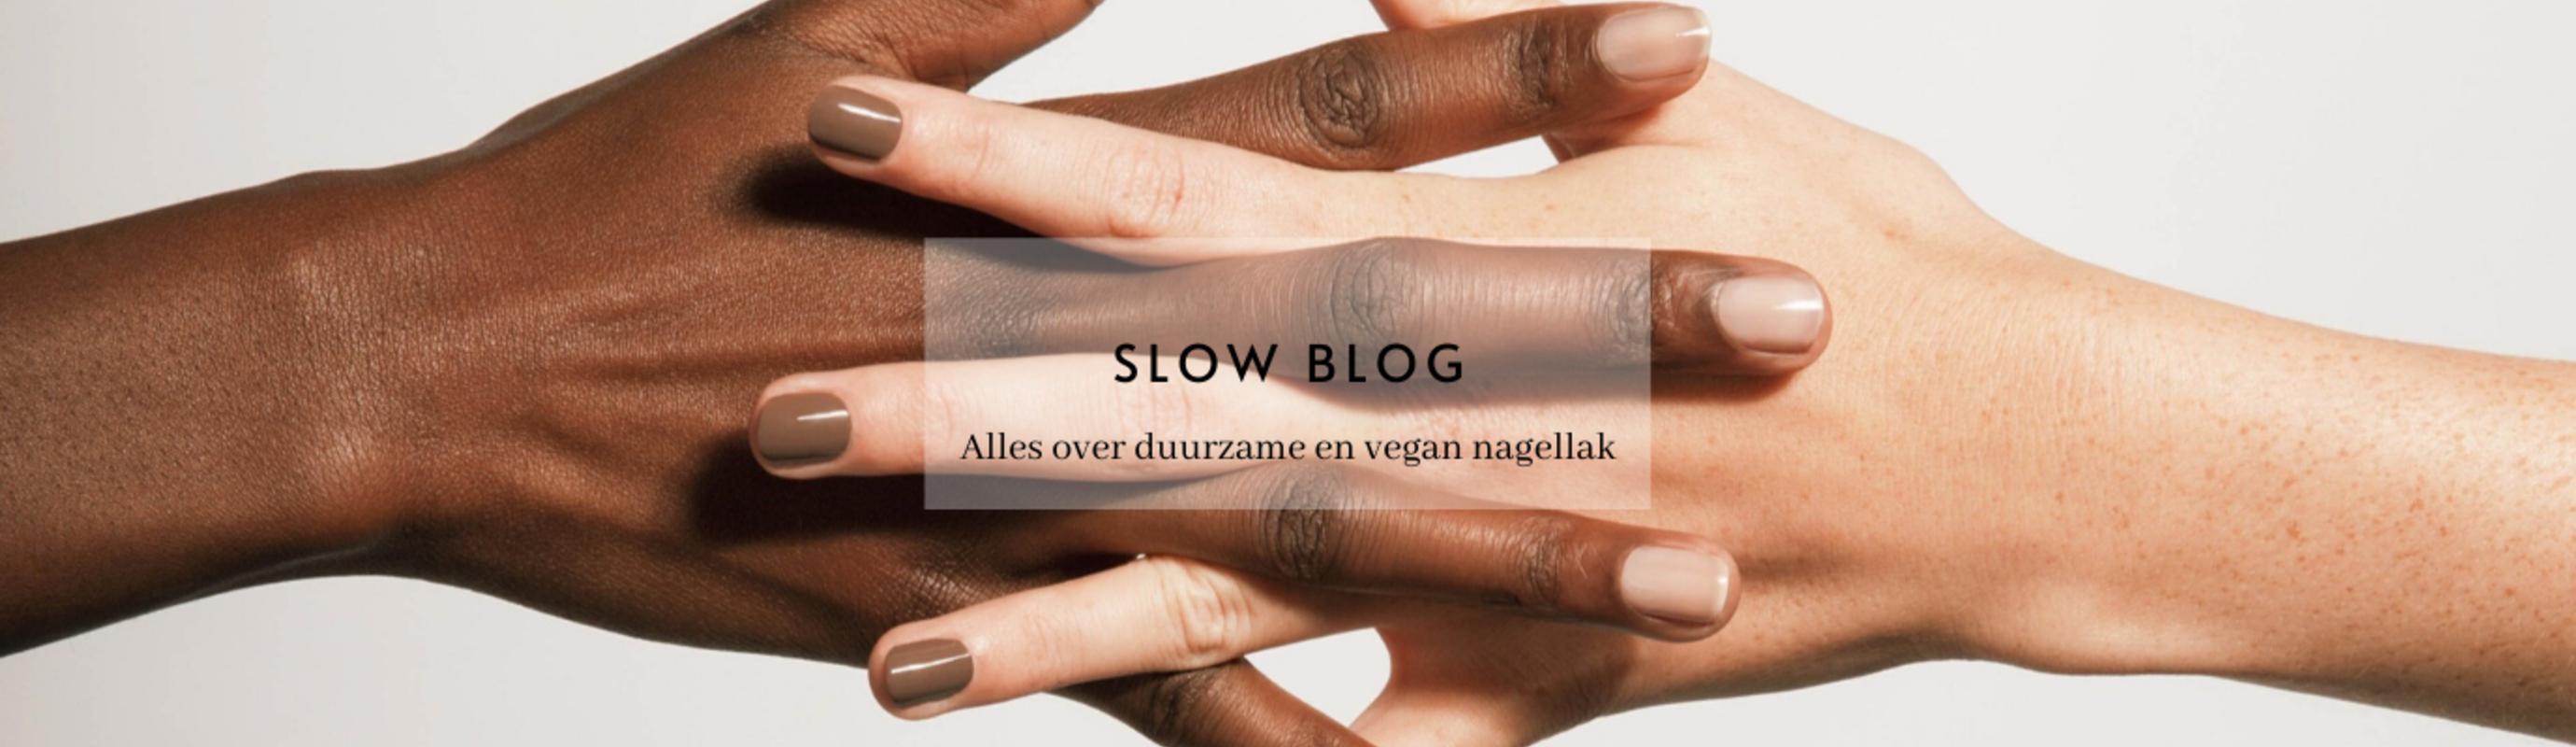 Alles over duurzame en vegan nagellak